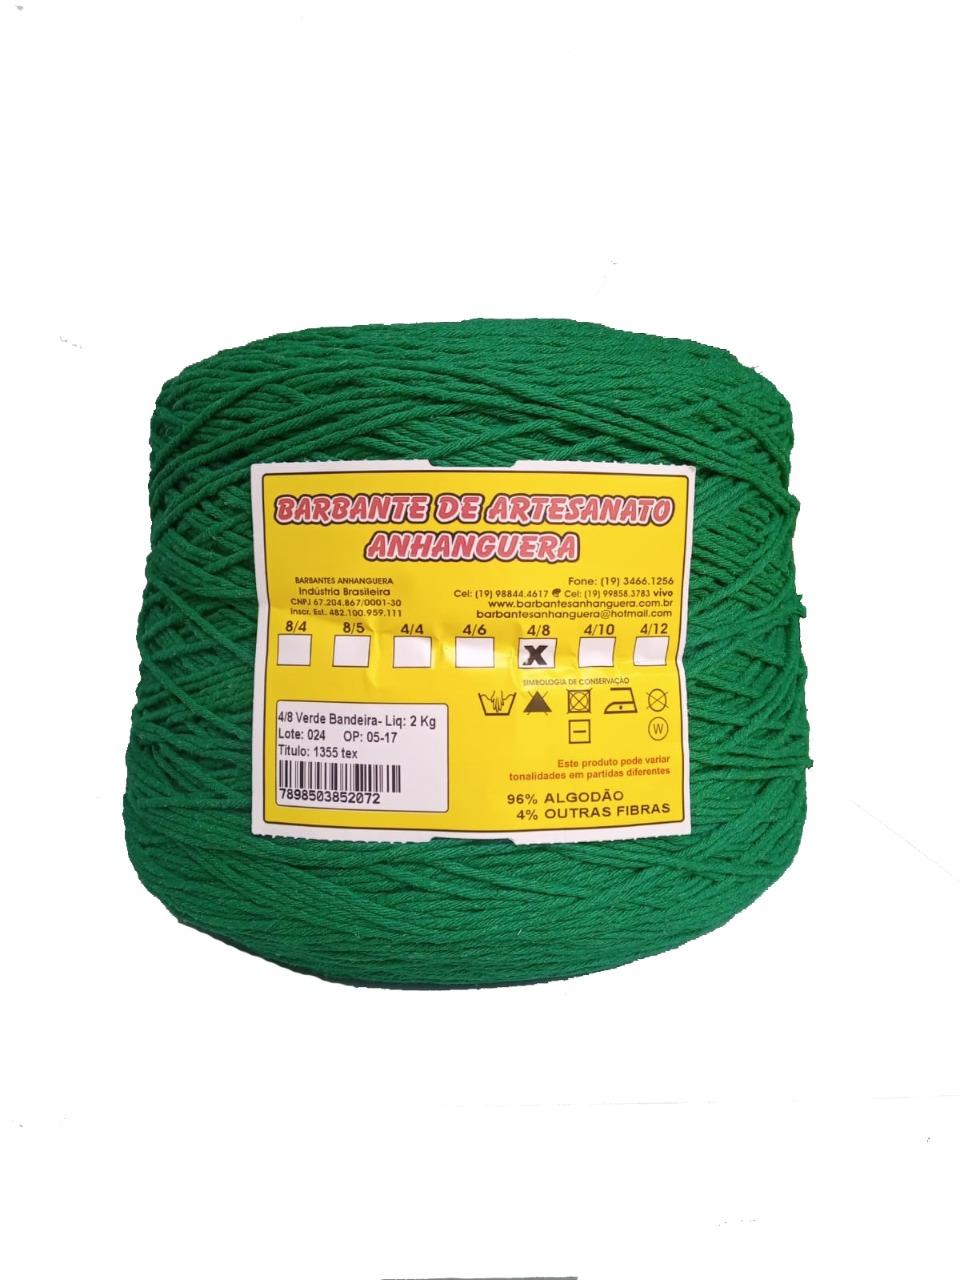 Barbante 4/8 2kg Verde Bandeira - Anhanguera